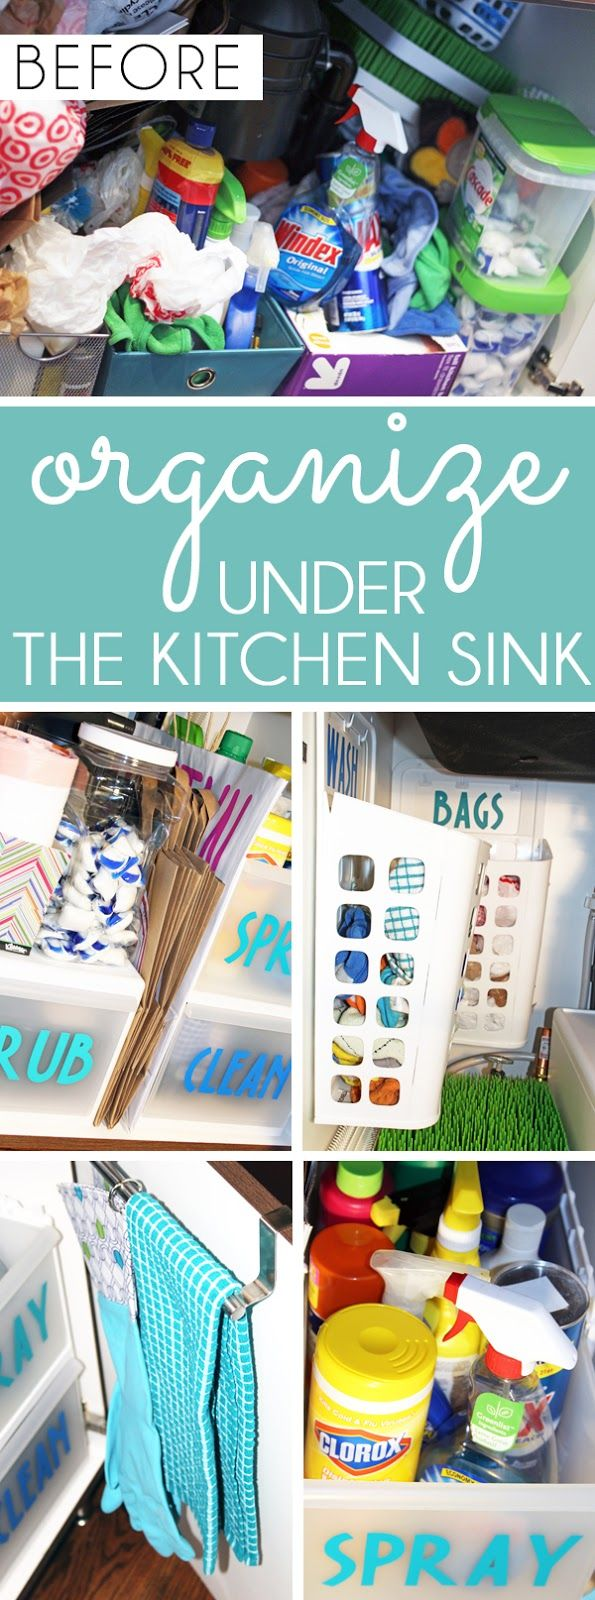 231 best Kitchen Style & Organization images on Pinterest ...